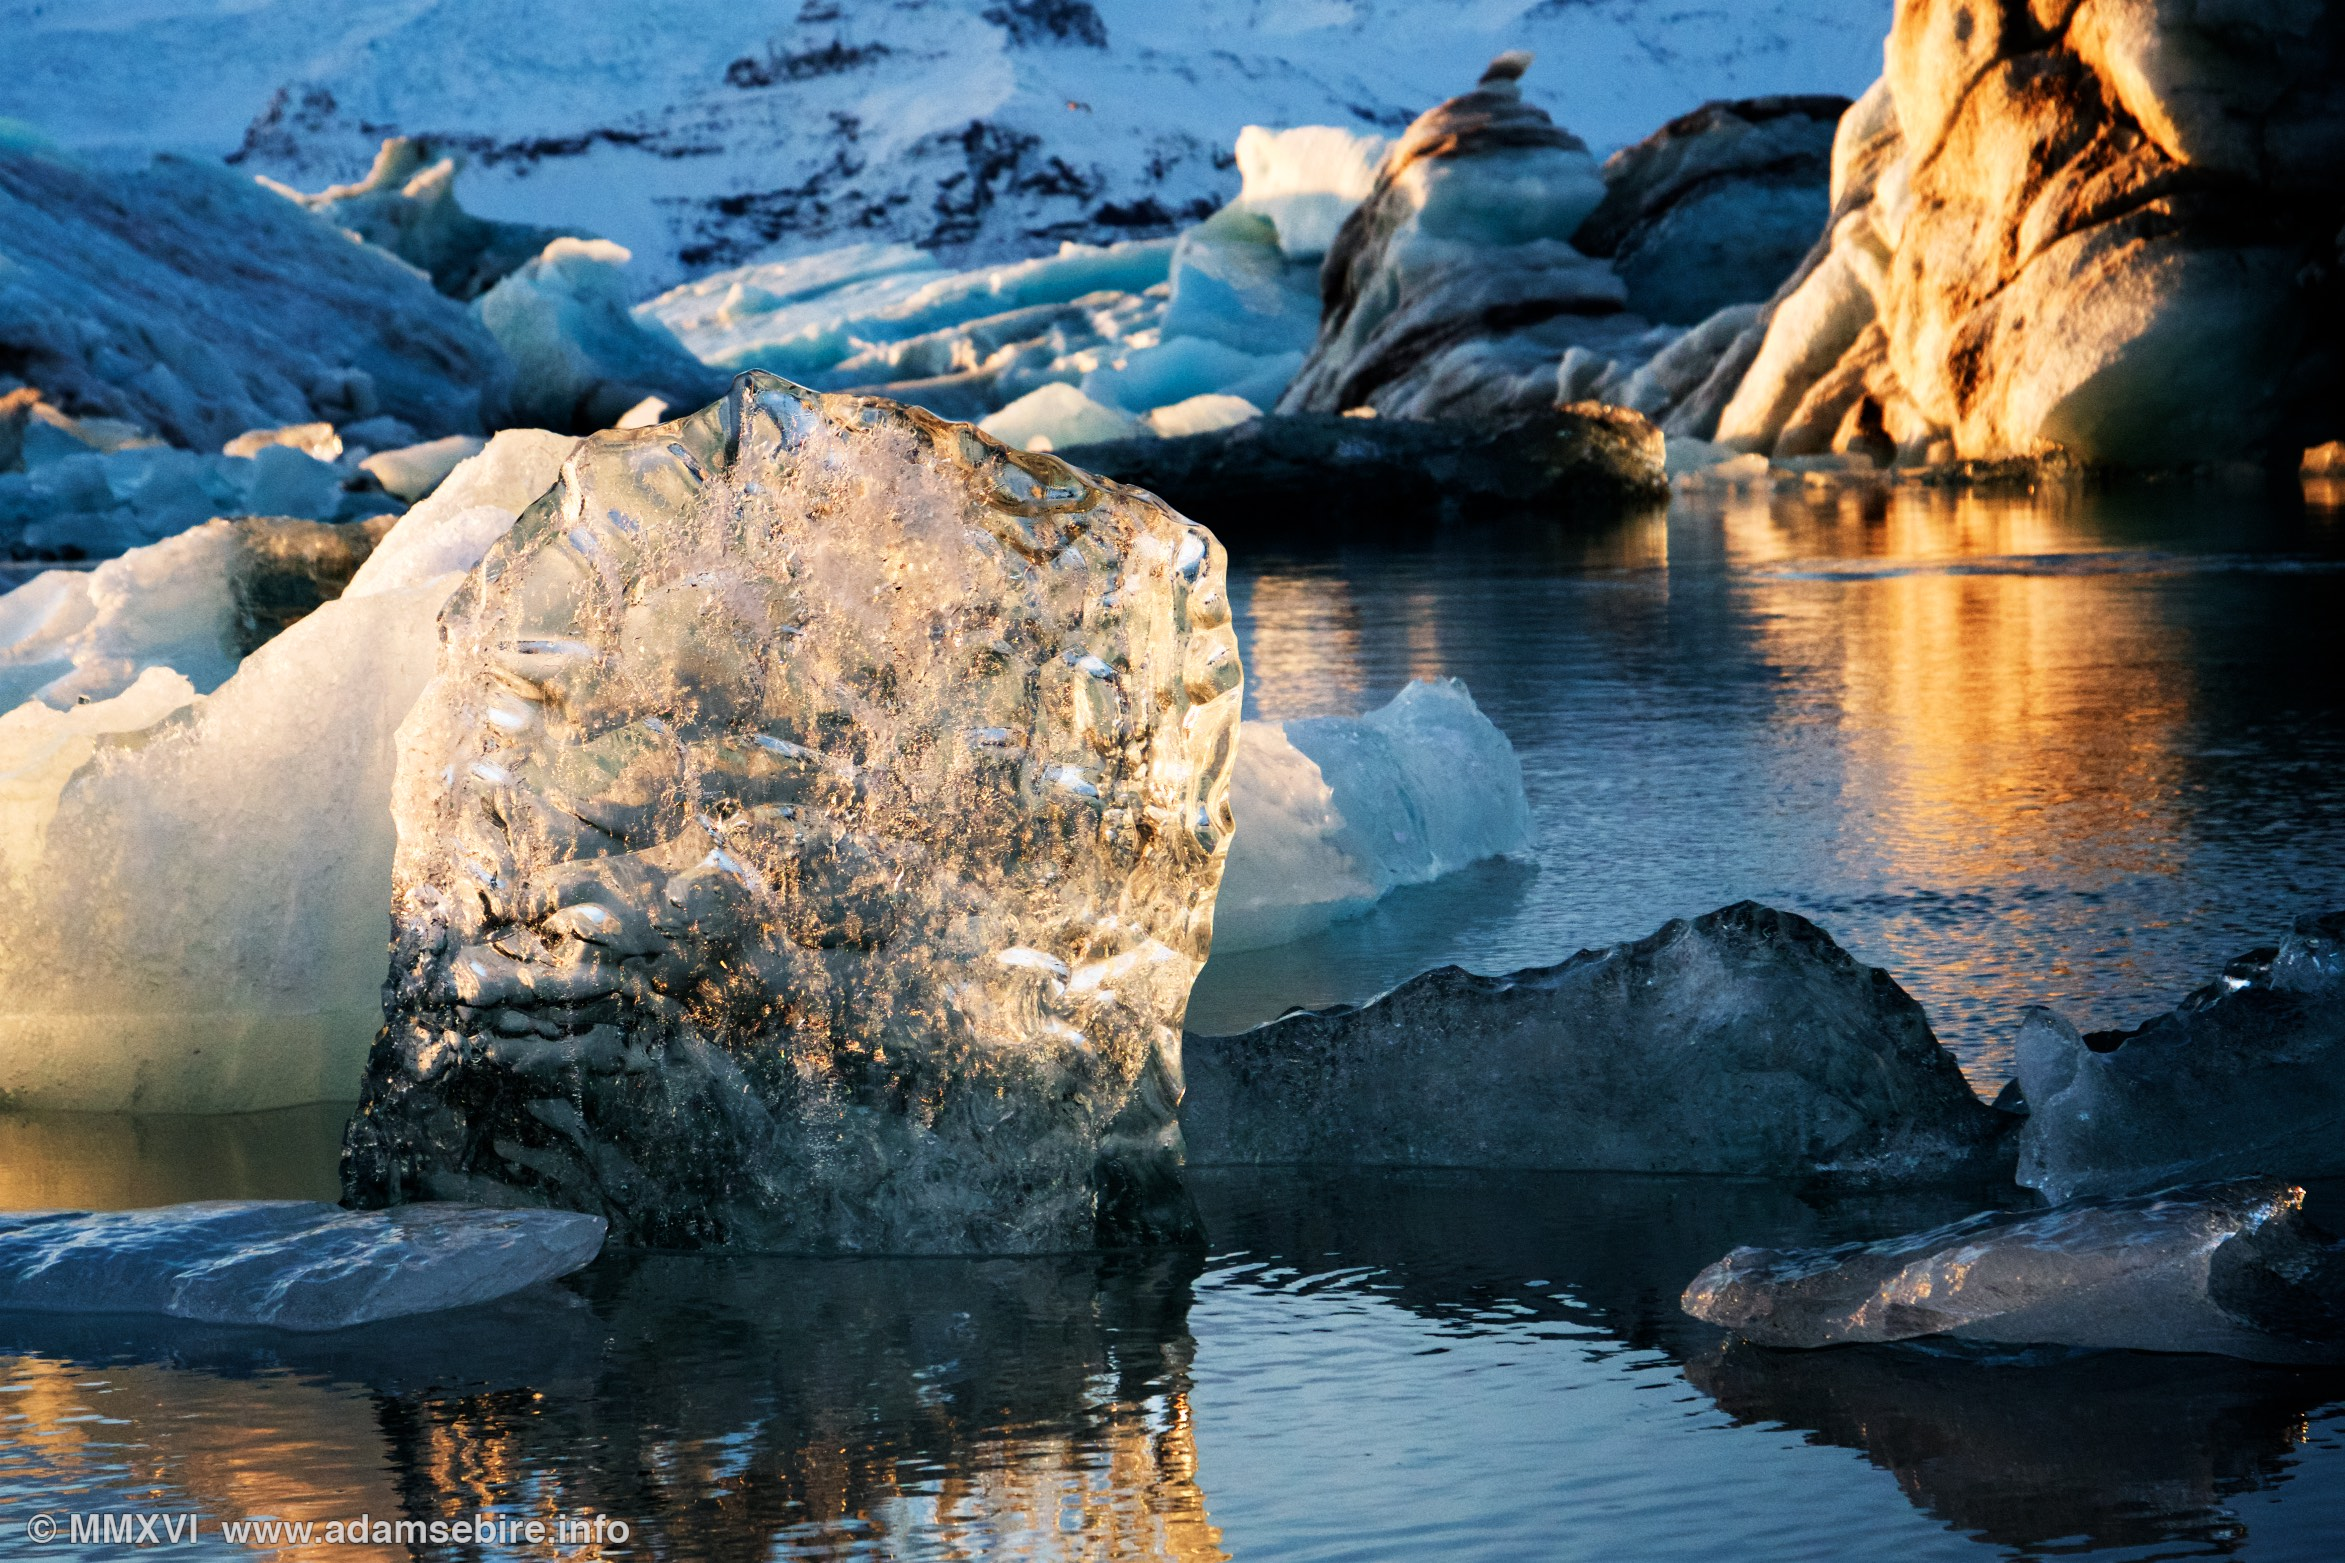 Jökulsárlón glacier lagoon Iceland — global warming and ice melting